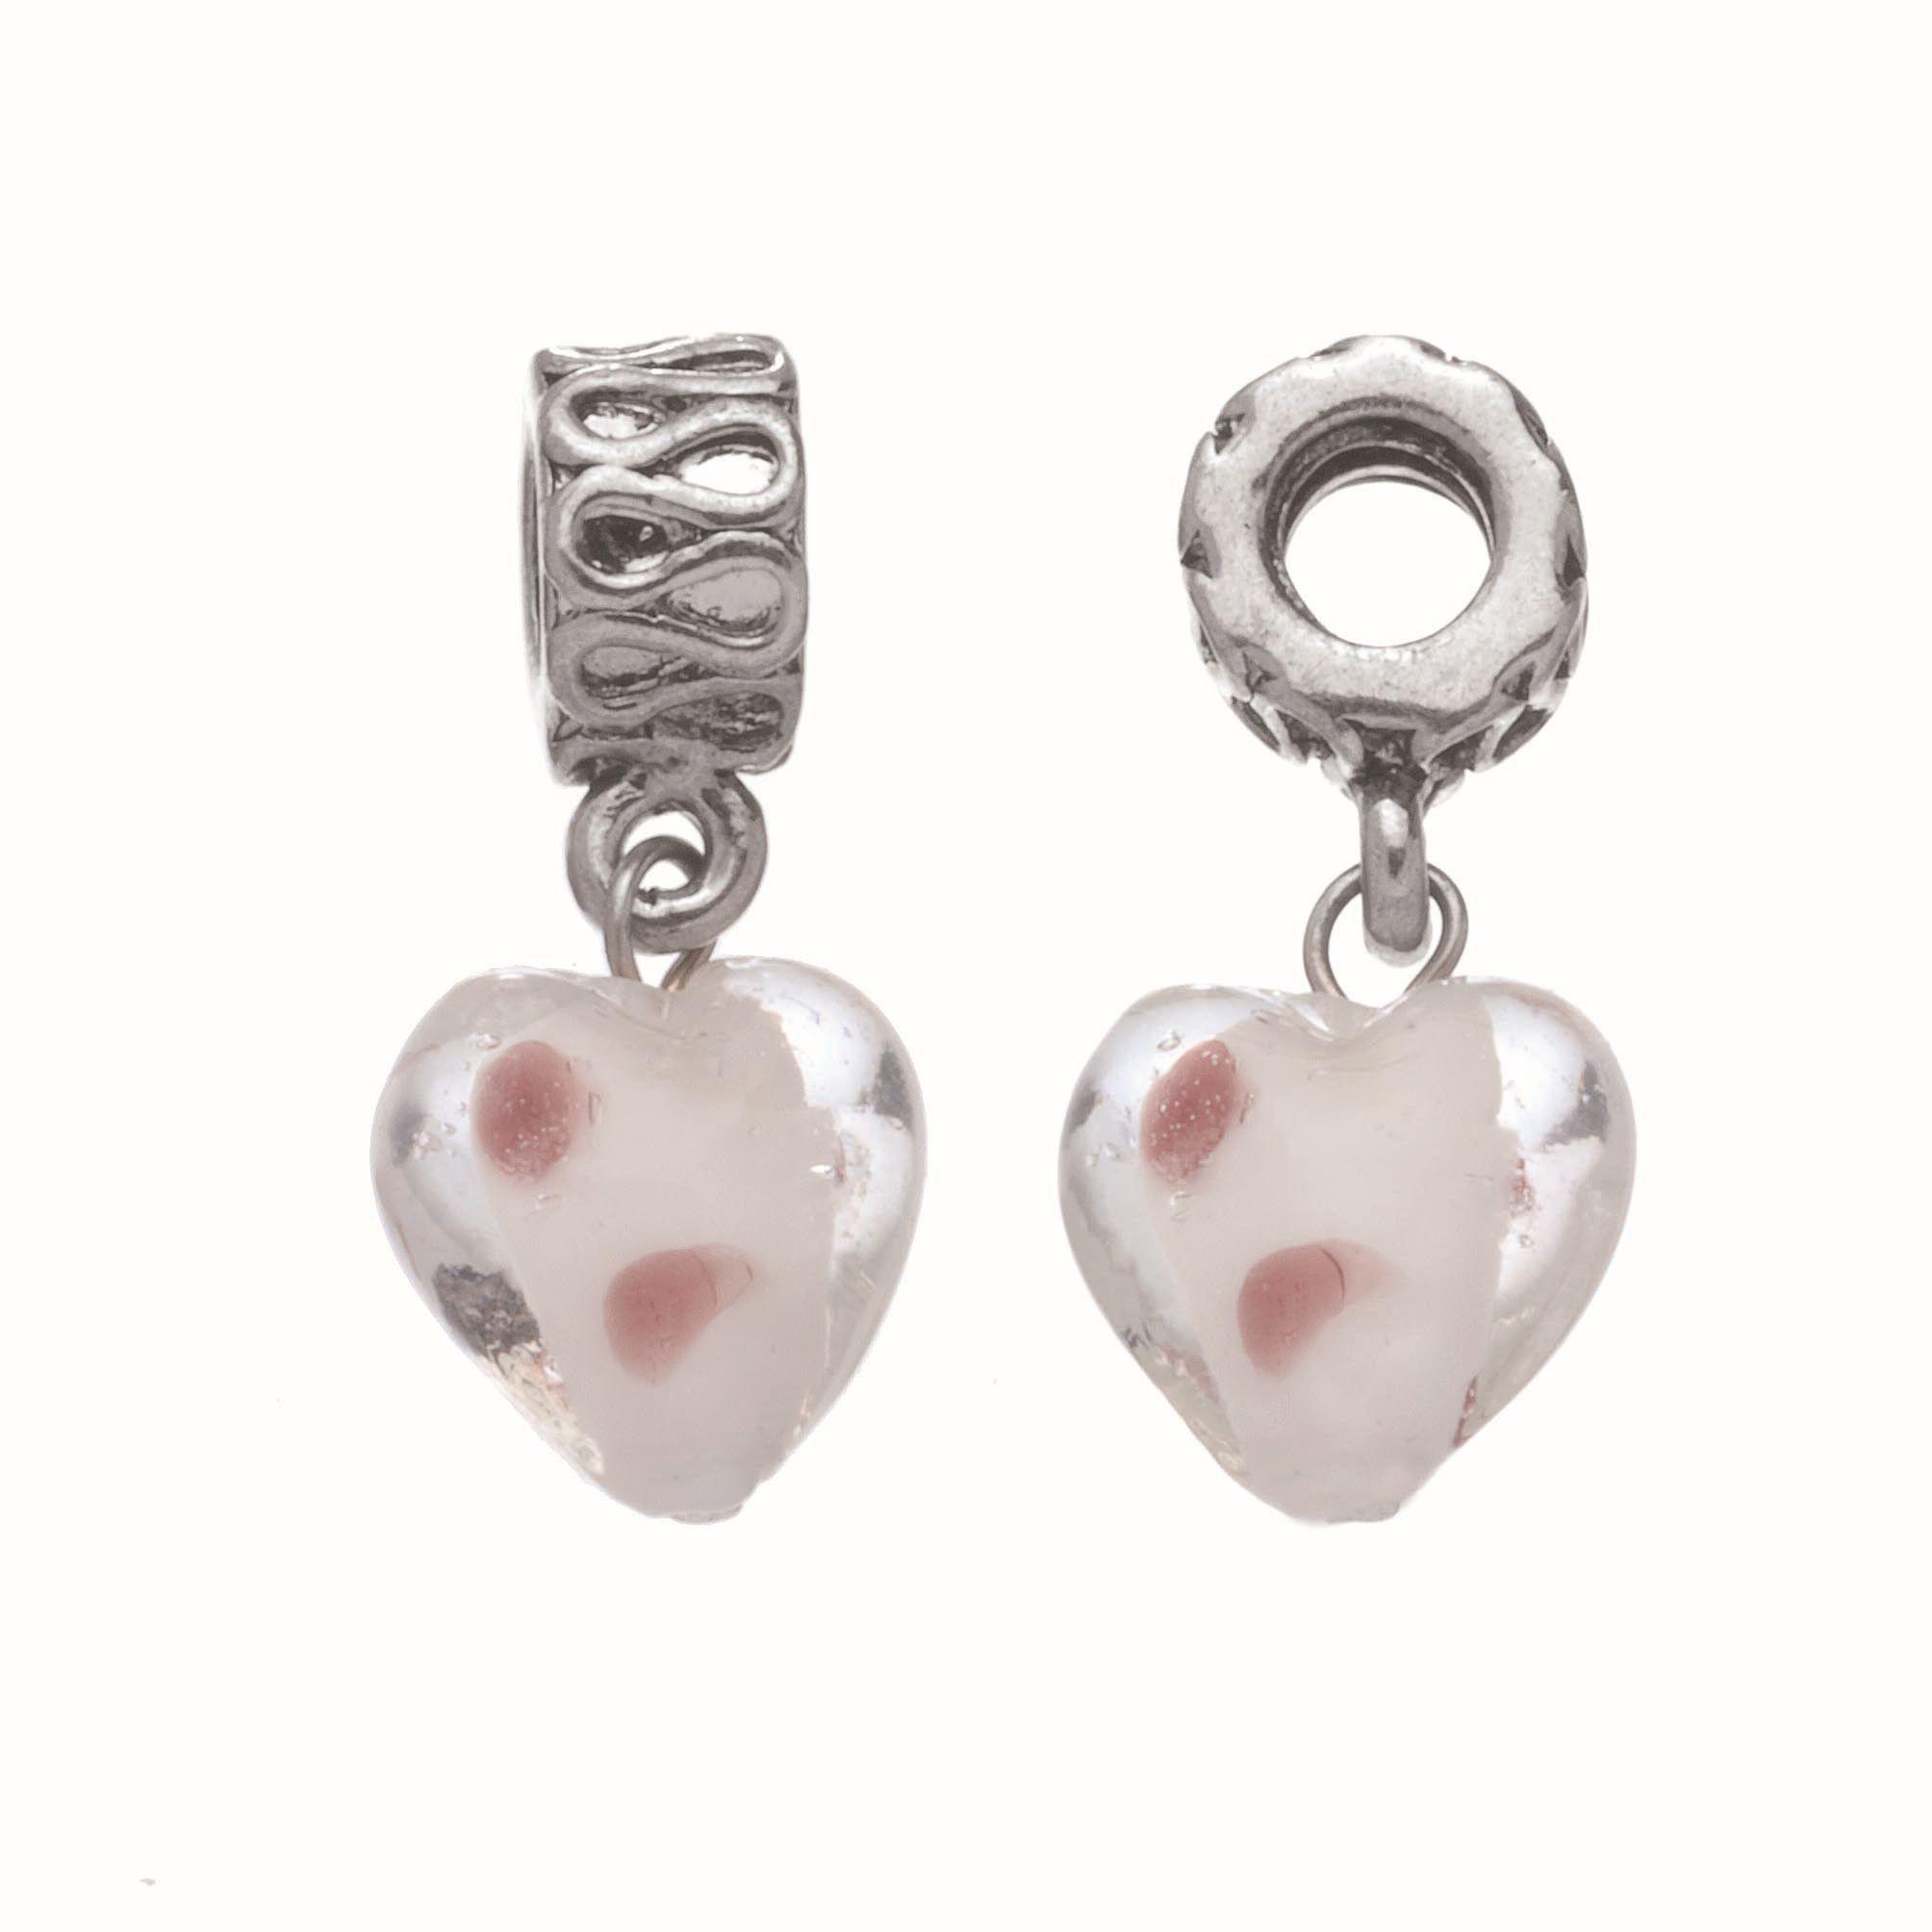 63713005 Кулон для браслета Сердце с глазурью 1 шт серебро Glorex